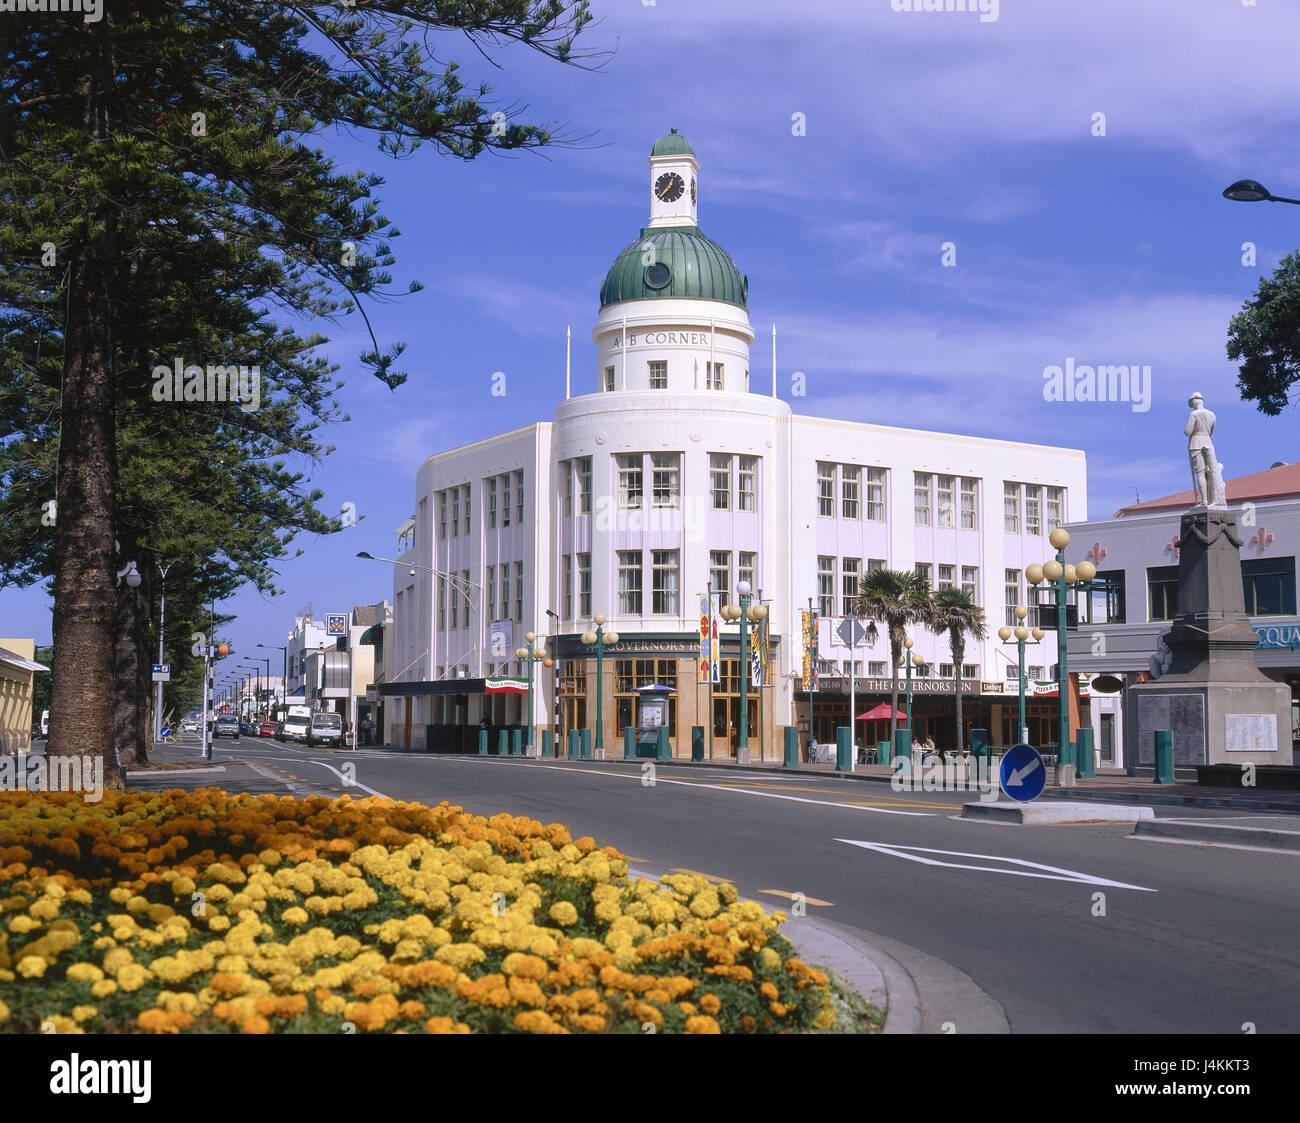 New Zealand, north island, Napier, hotel, street scene